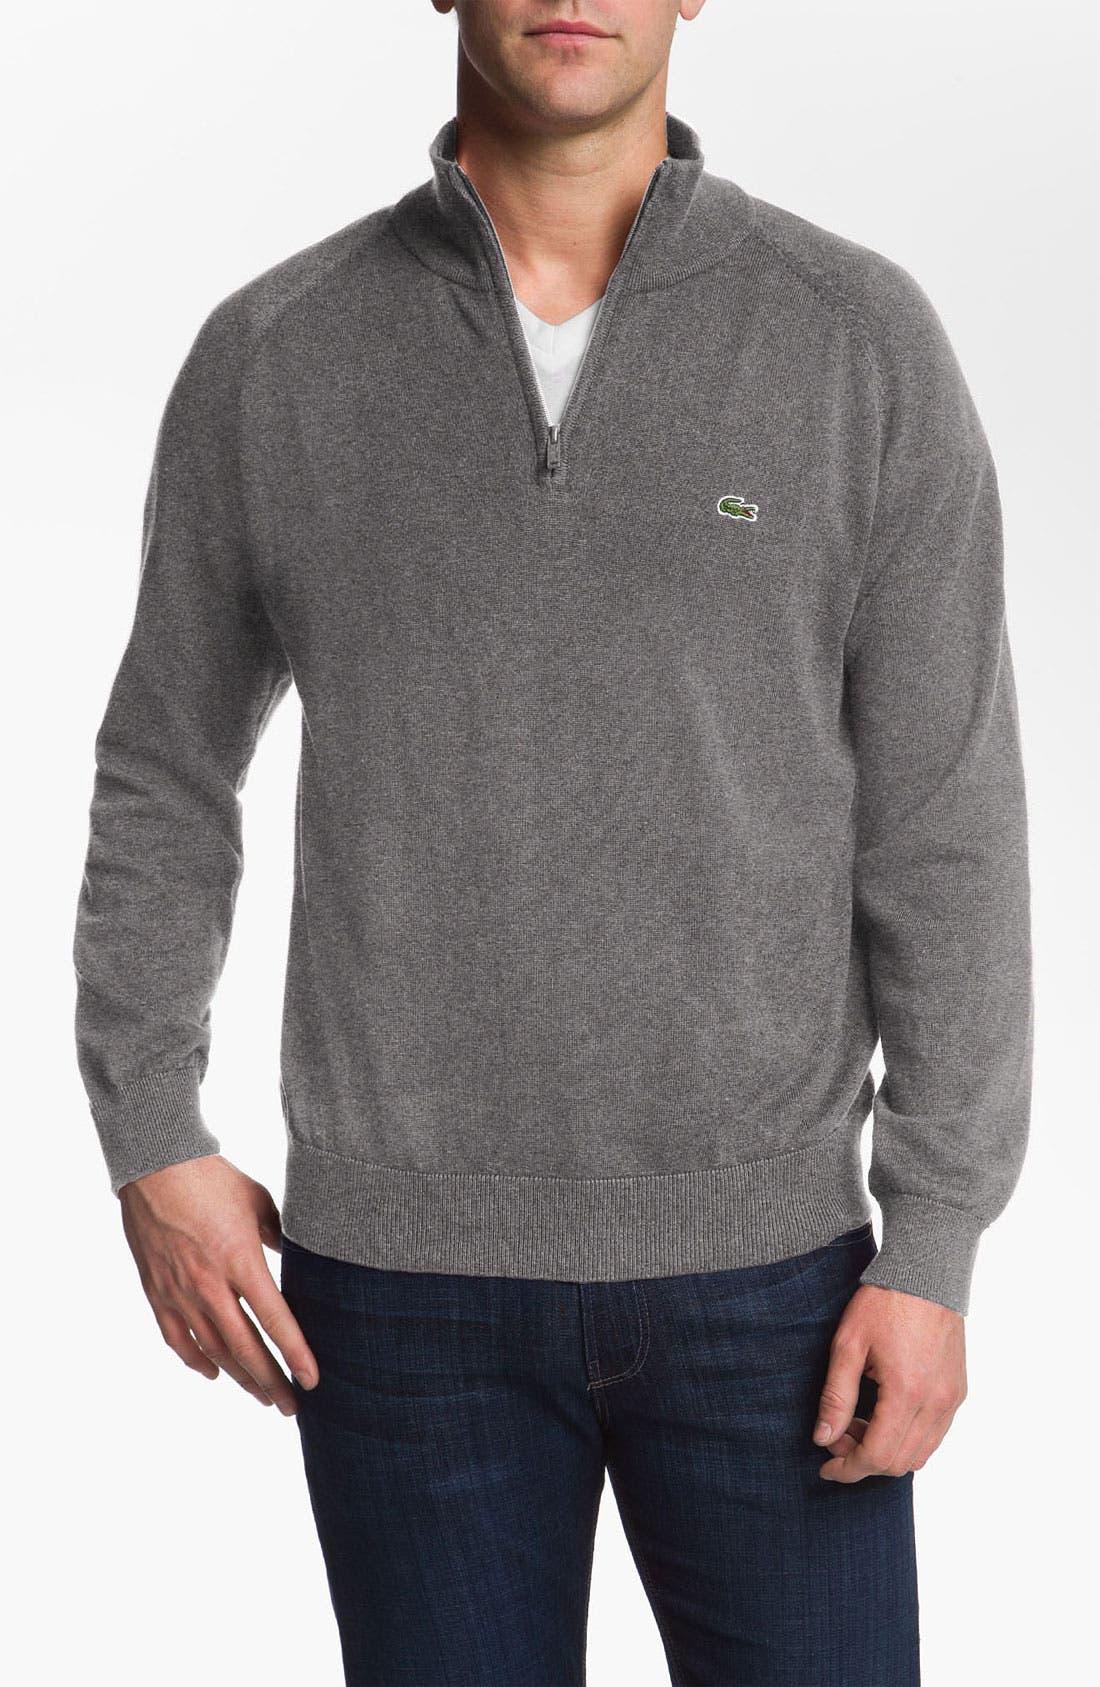 Quarter Zip Regular Fit Sweater,                         Main,                         color, Stone/ Black